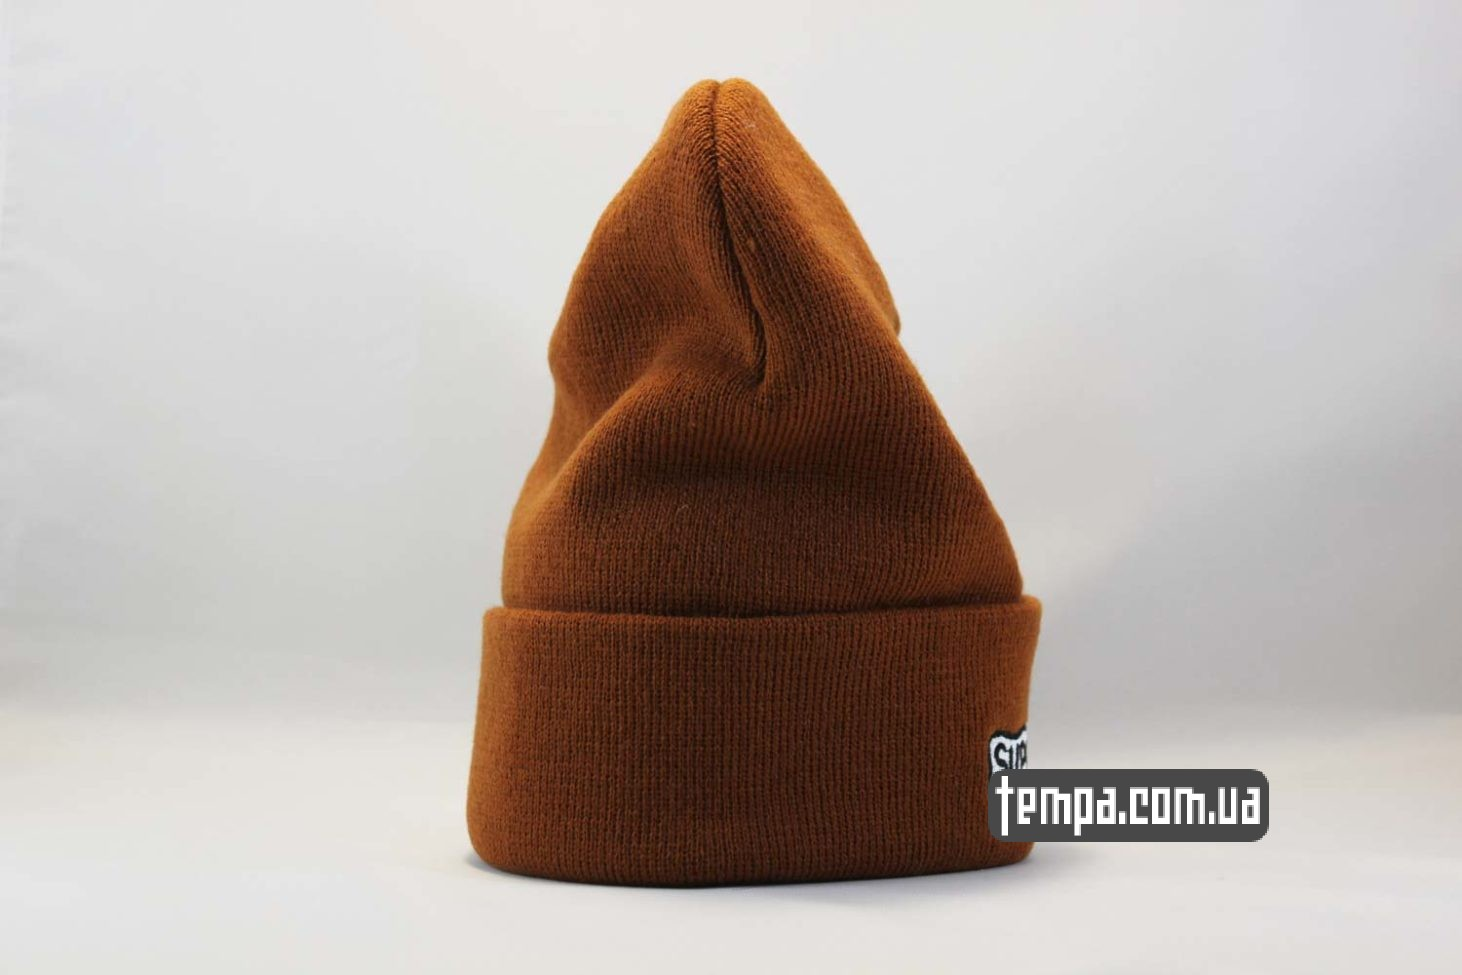 магазин Украина шапка beanie SUPREME supream coolio коричневая